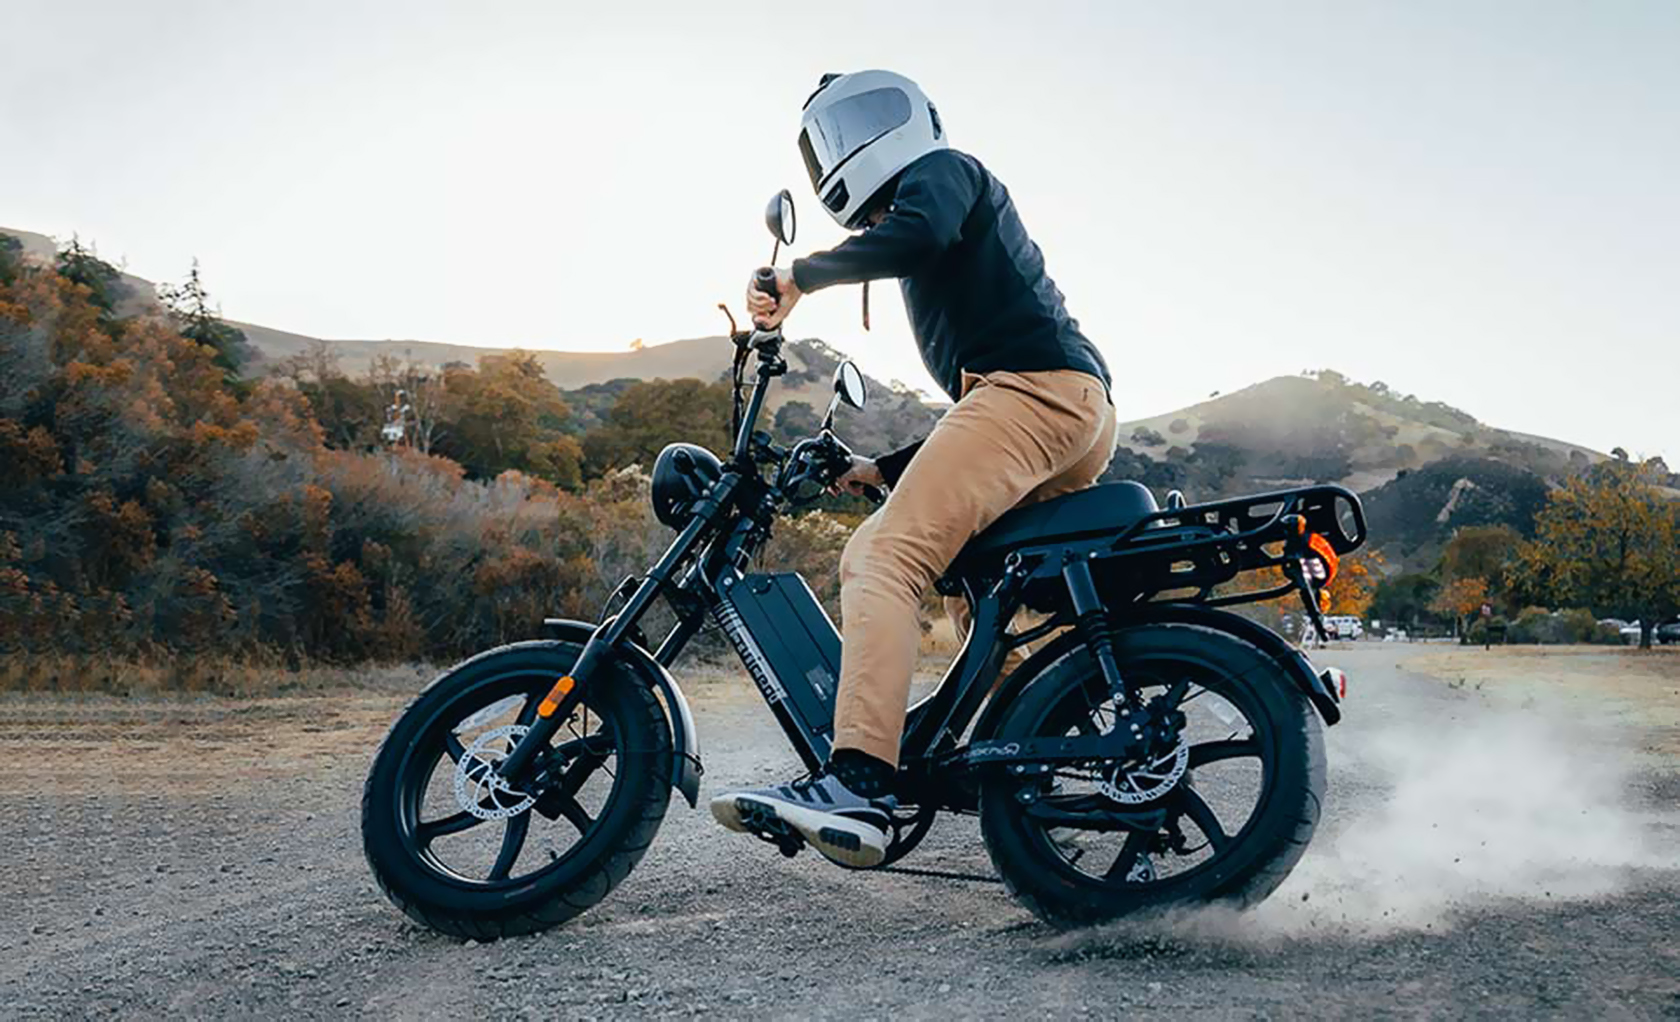 Juiced Bikes' HyperScorpion Commuter e-bike